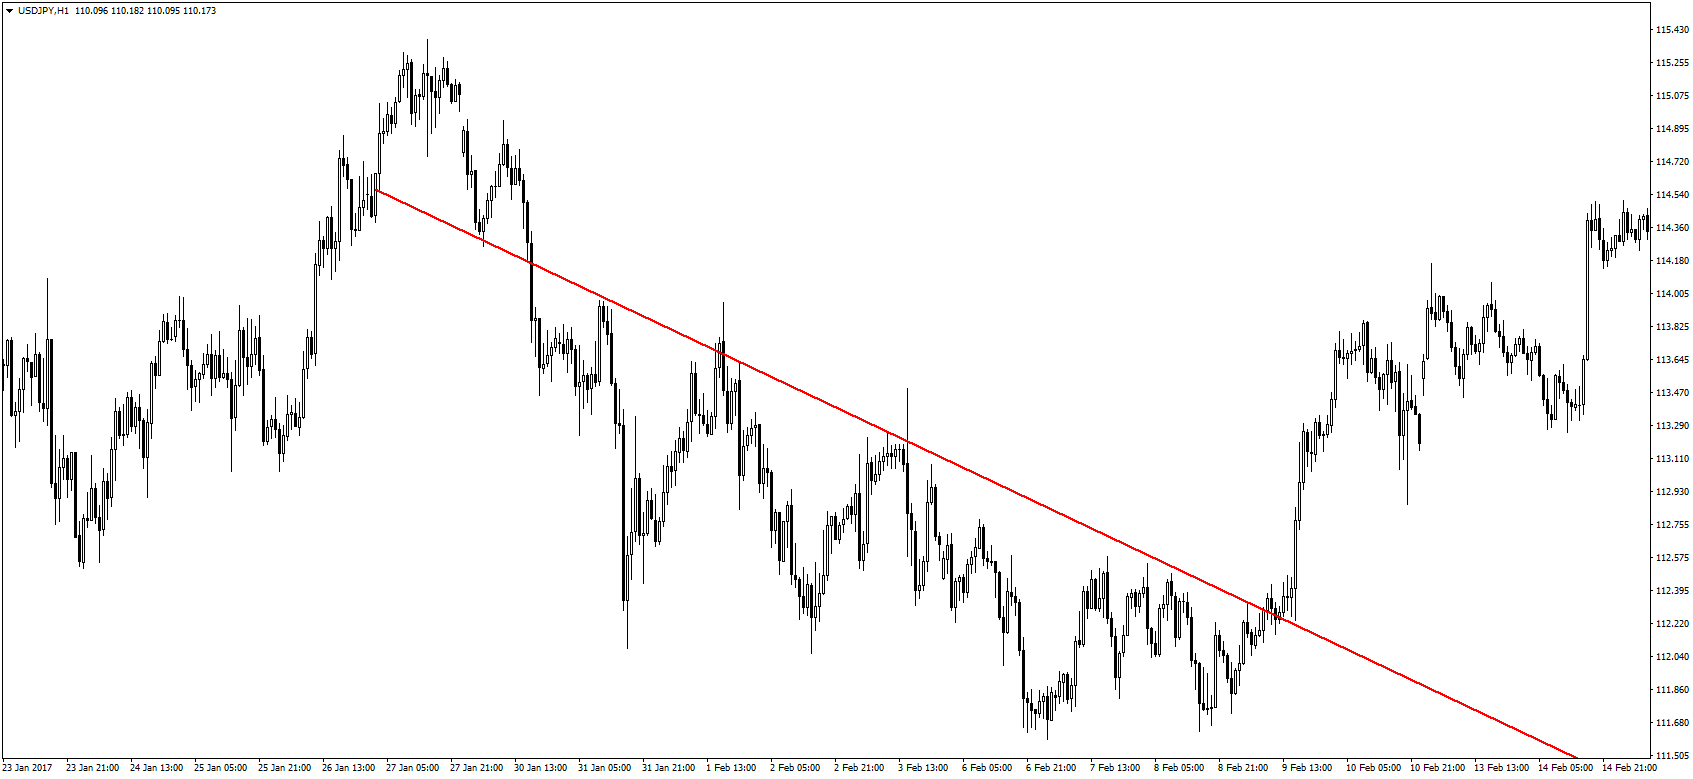 Day Trading pentru Începători ↗️ [Ghid Actualizat 2021]